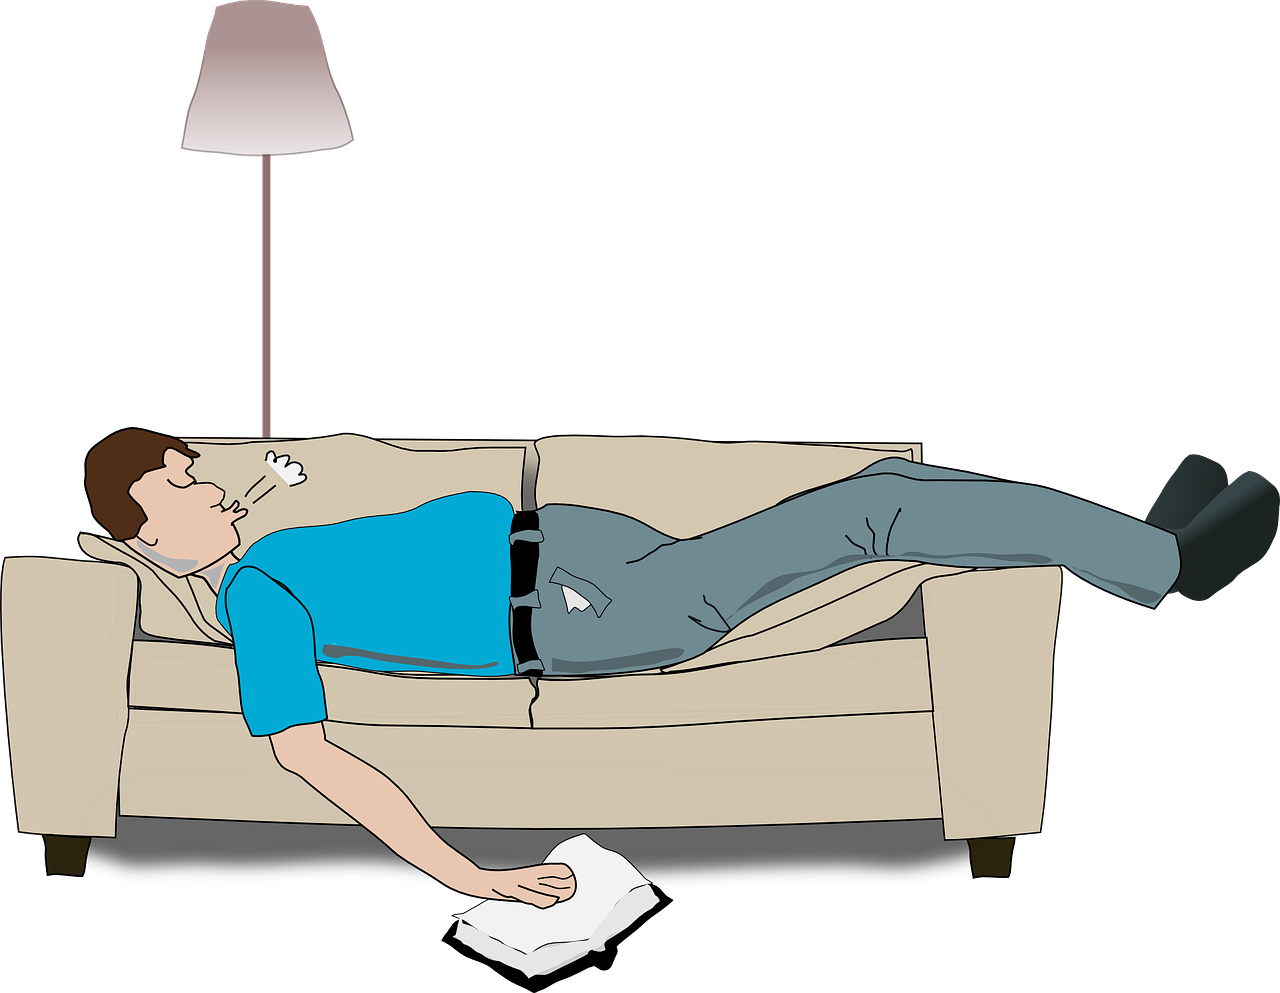 metody leczenia chrapania i bezdechu sennego